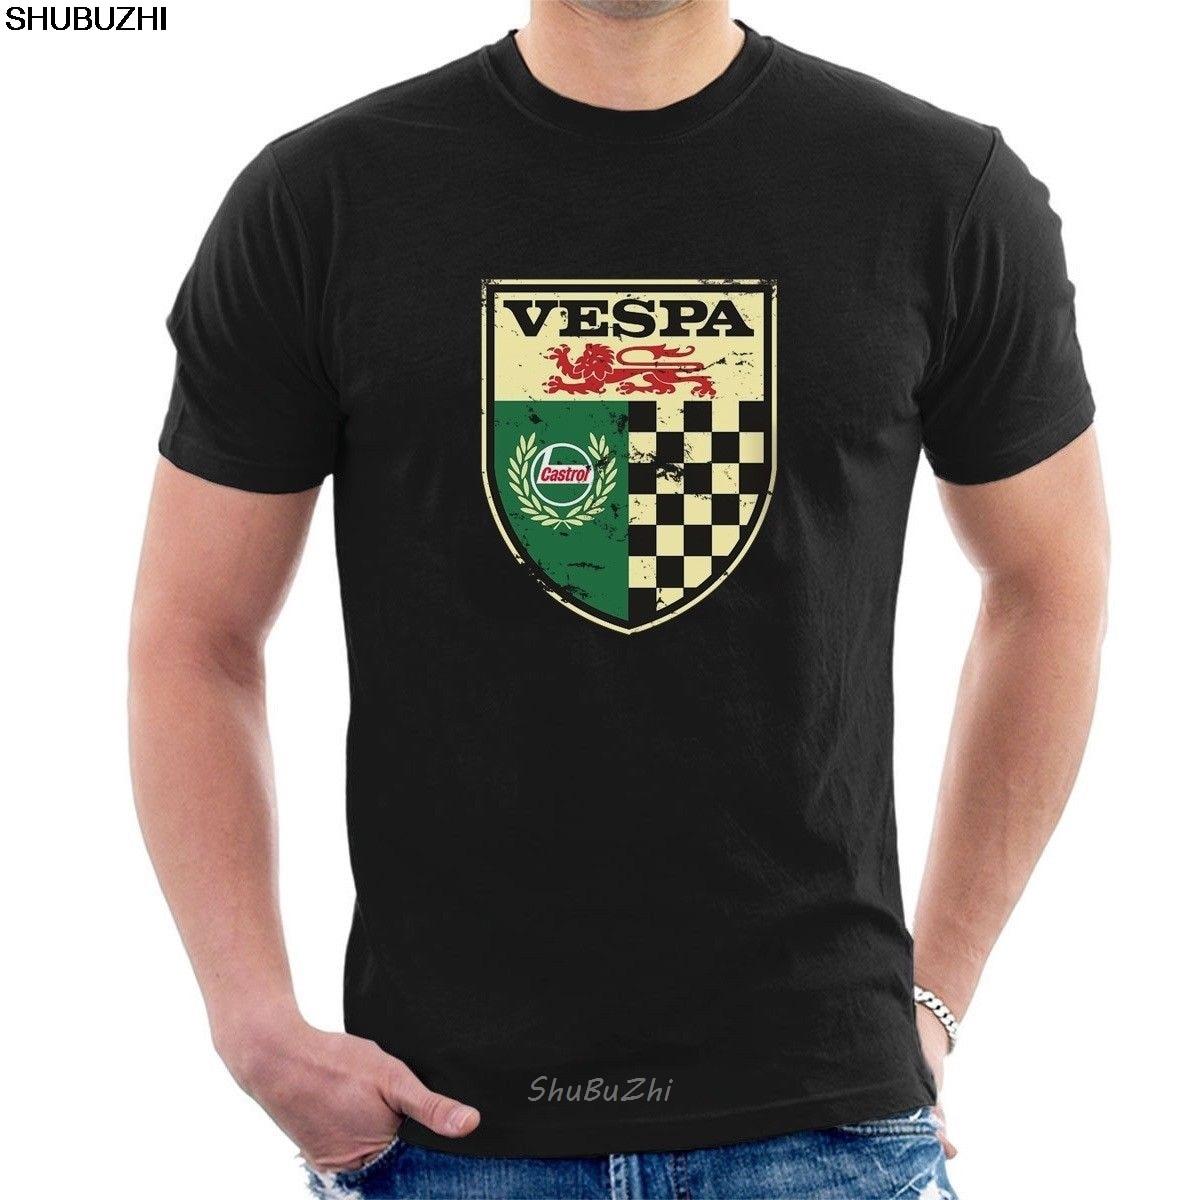 NEW VESPA CASTROL VINTAGE SIGN T-SHIRT Distressed Classic Retro Oil M03 Cartoon T Shirt Men New Fashion Tshirt Loose Sbz3221